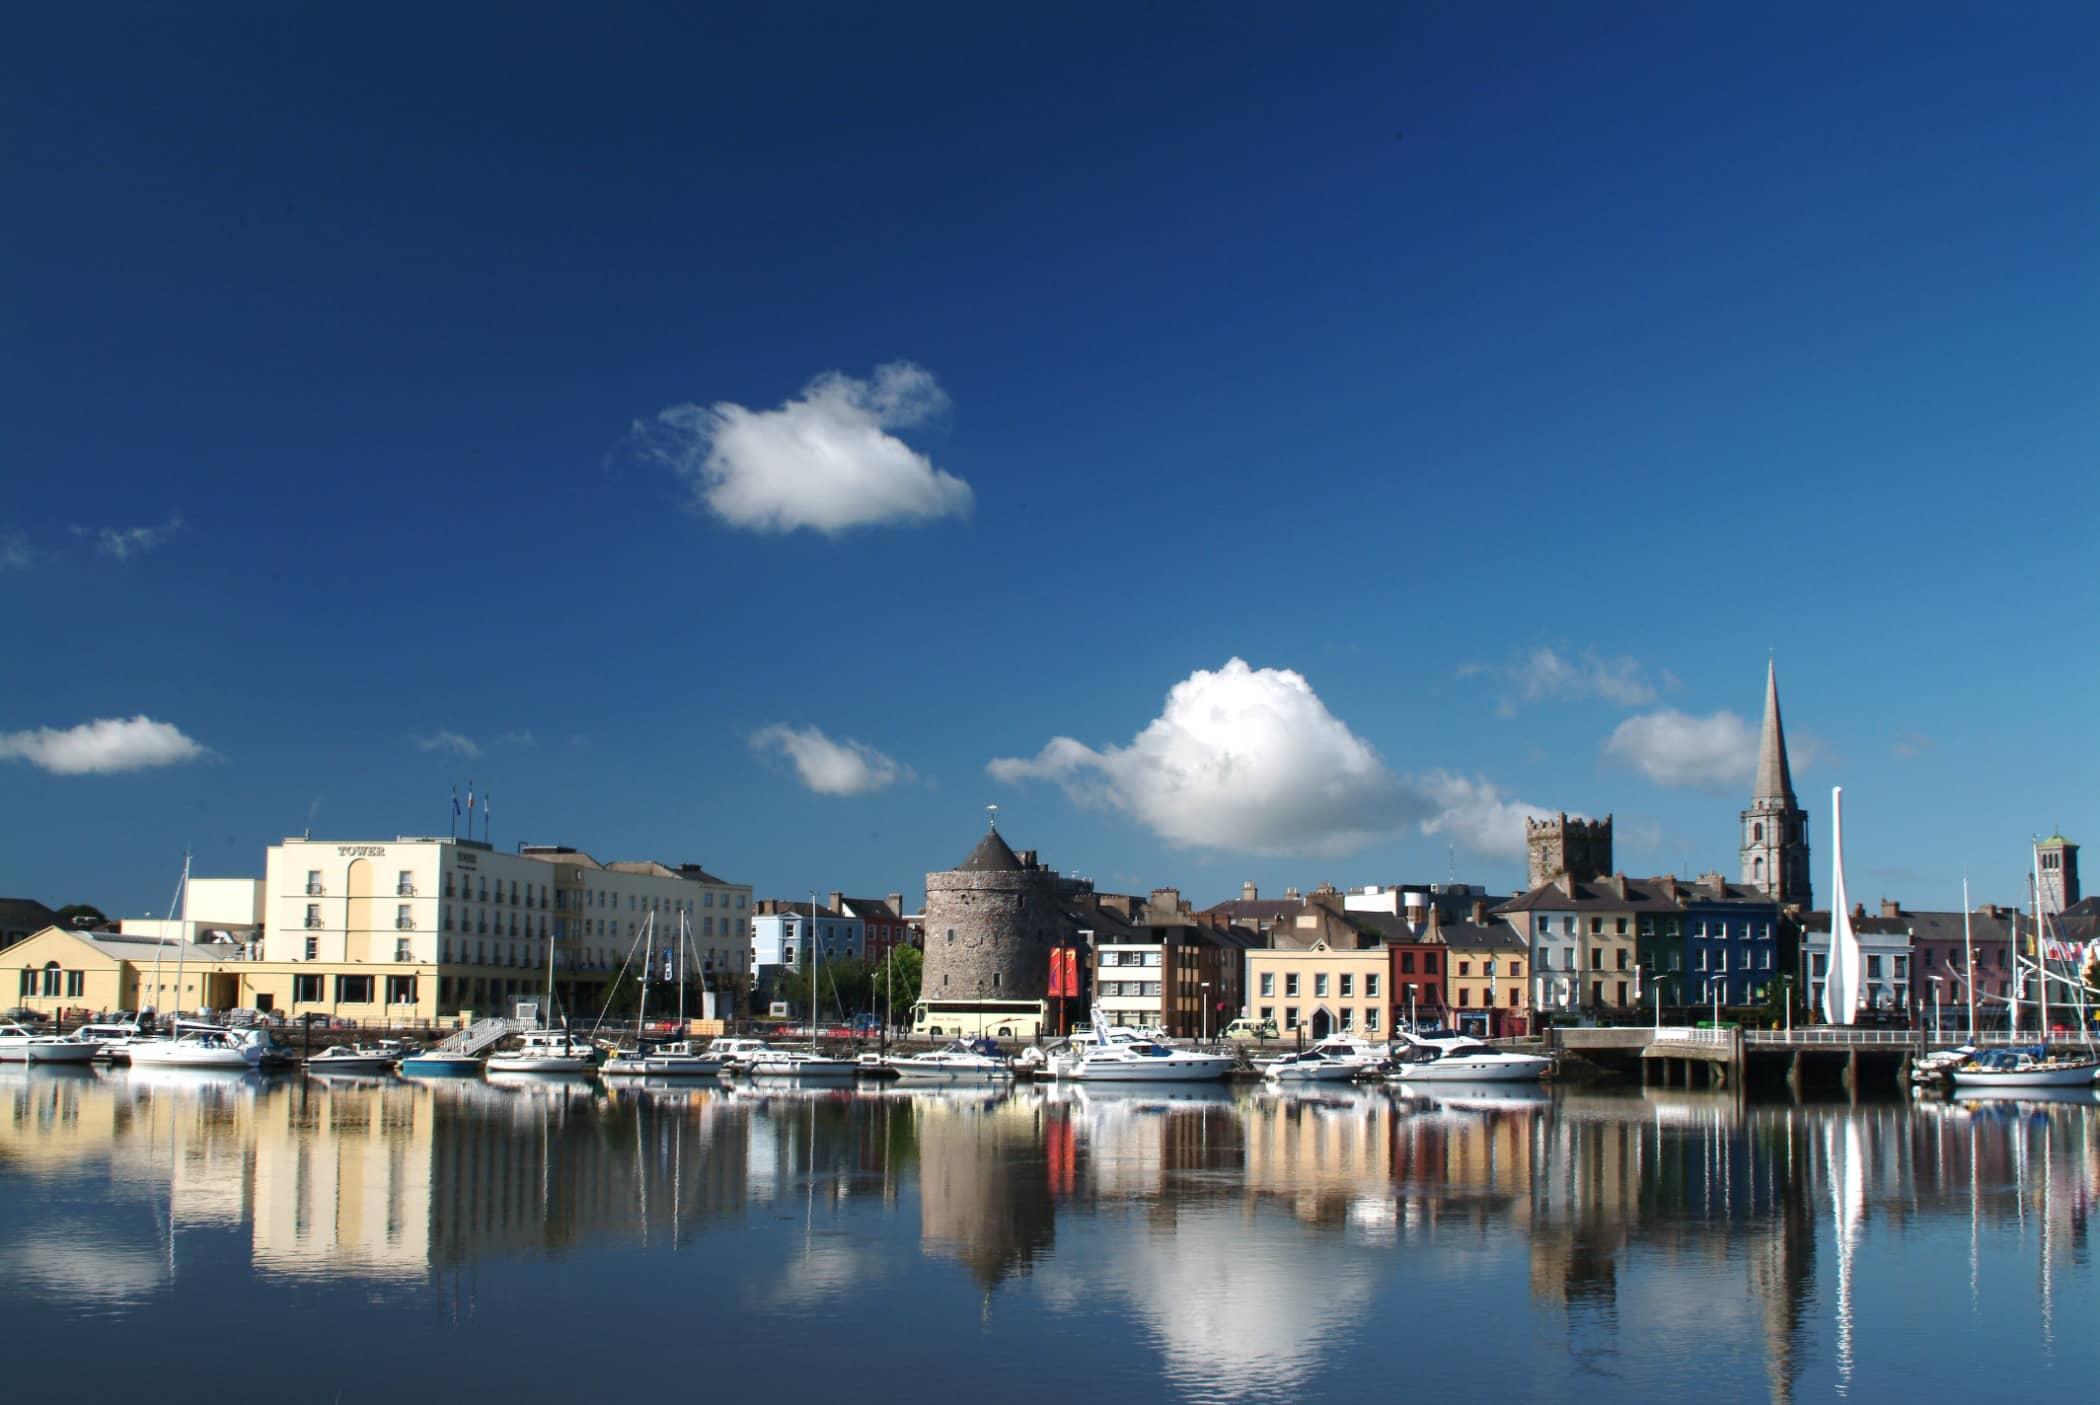 Waterford Quays, LEAD IMAGE.jpg